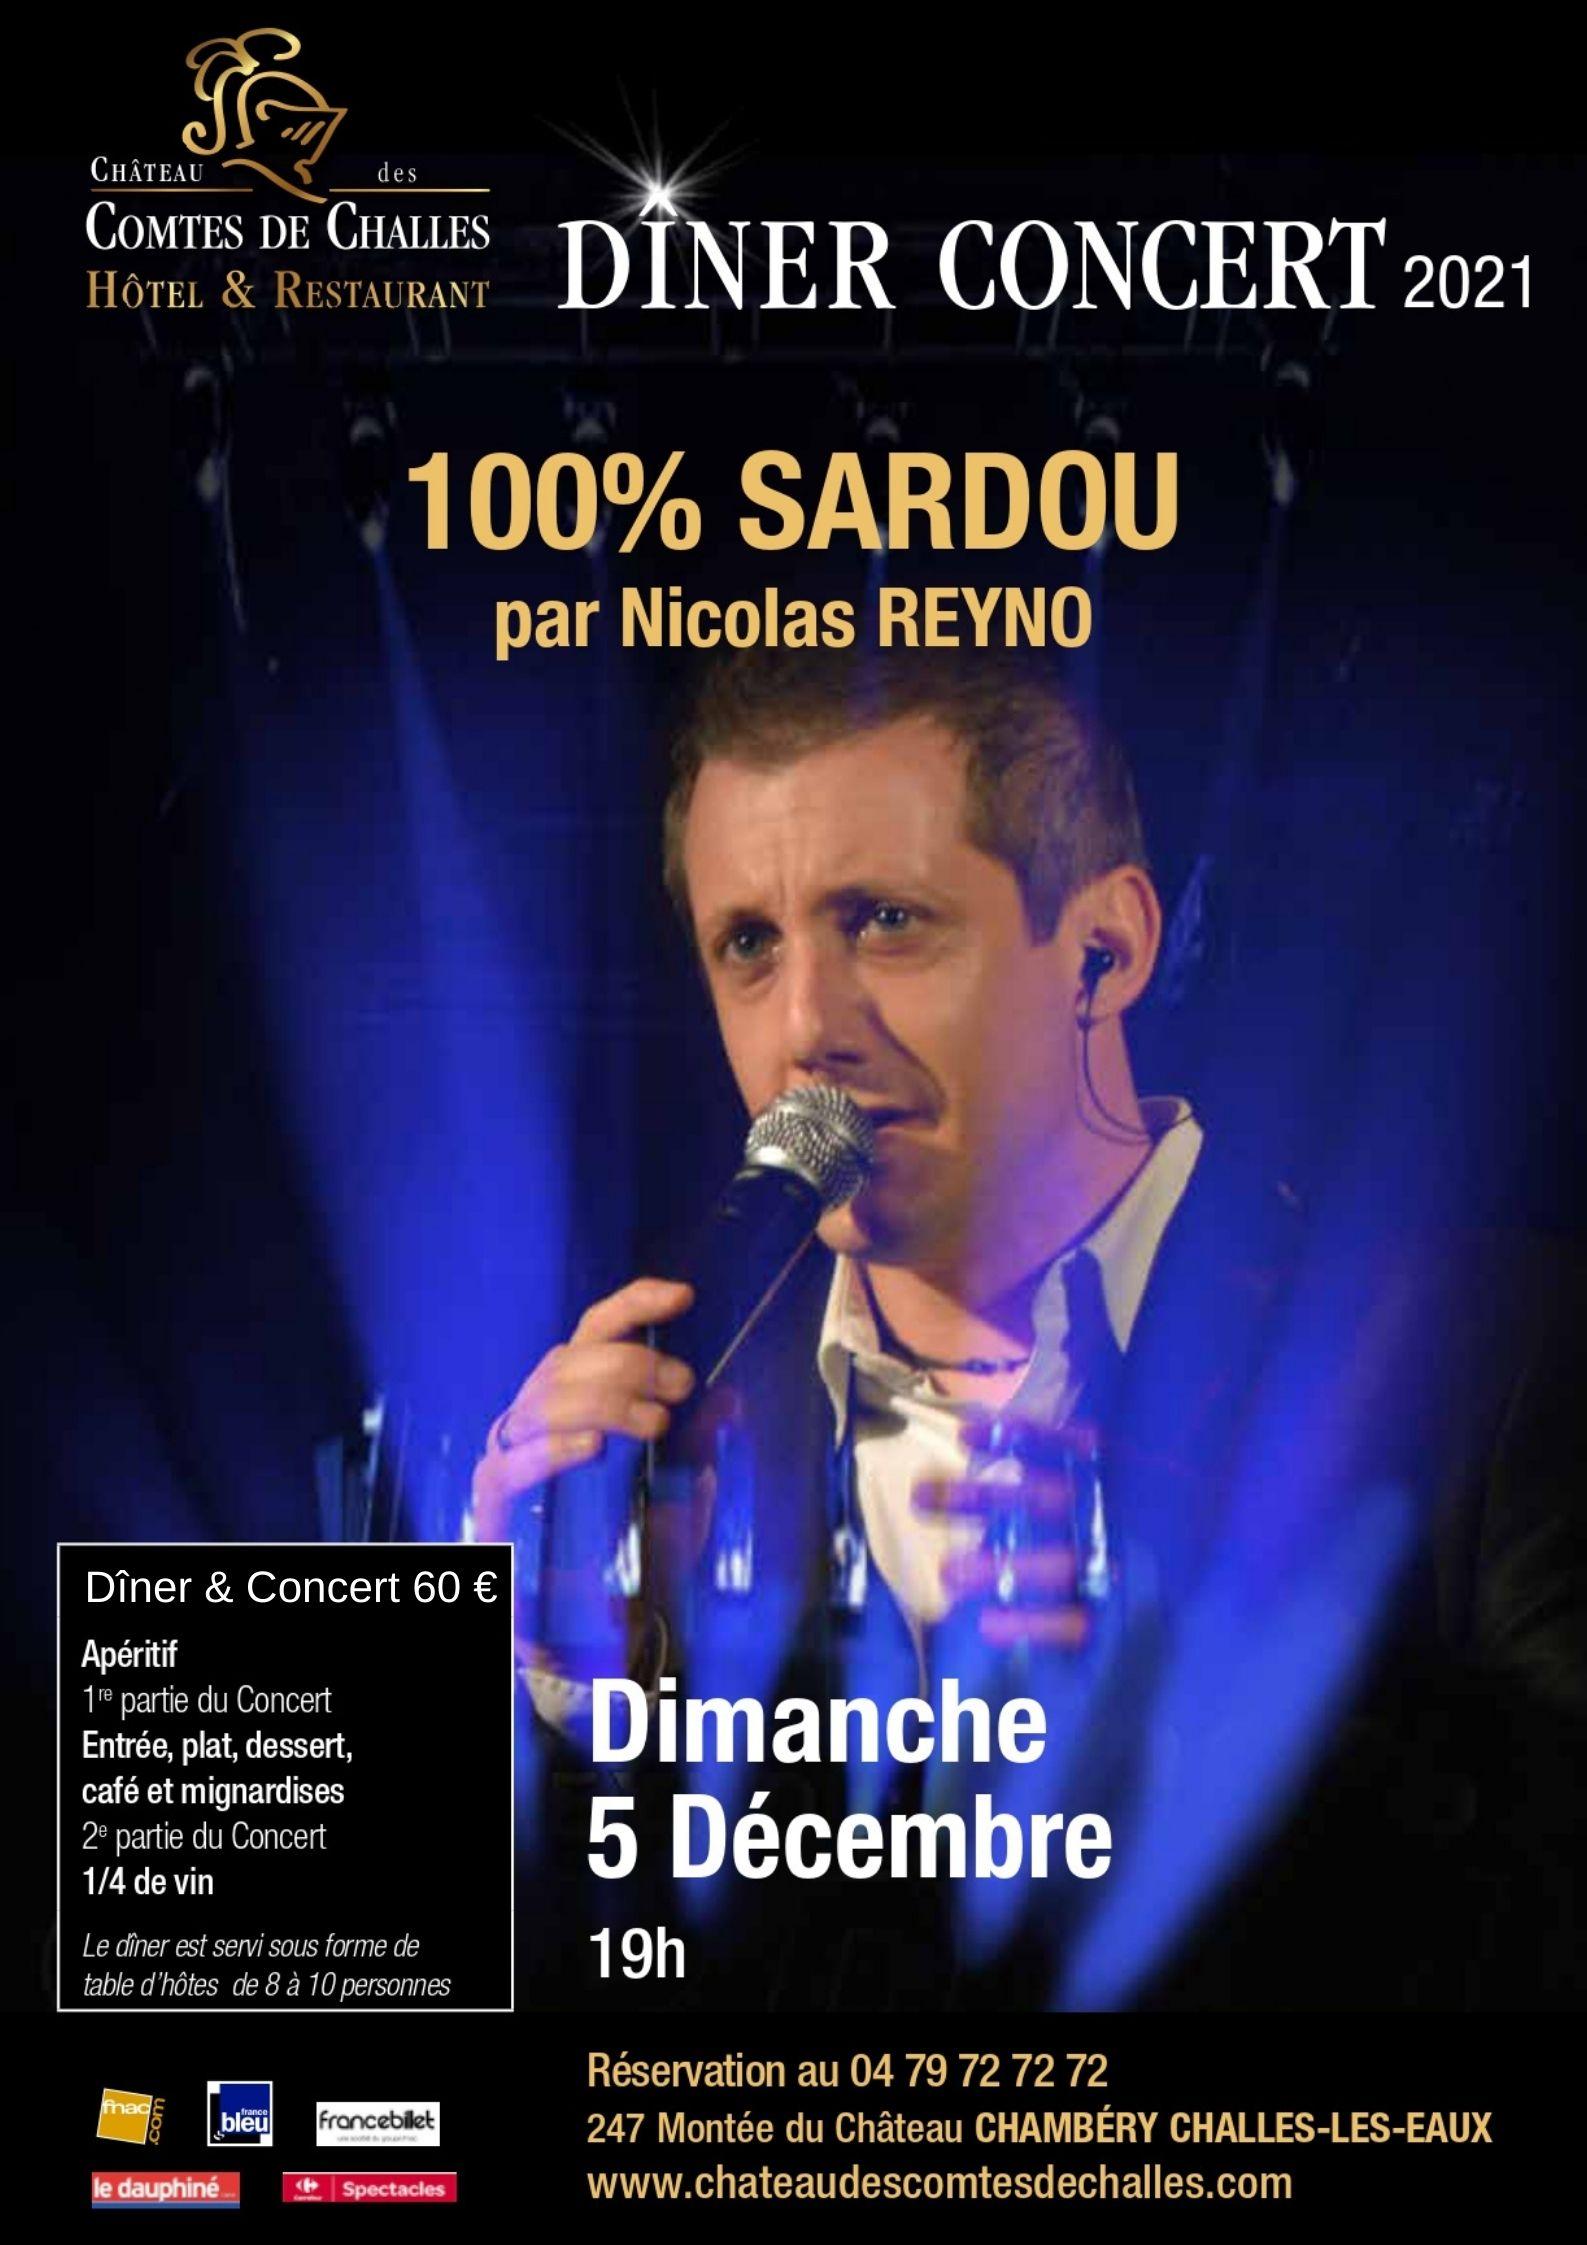 DINER CONCERT - 100% SARDOU par Nicolas REYNO